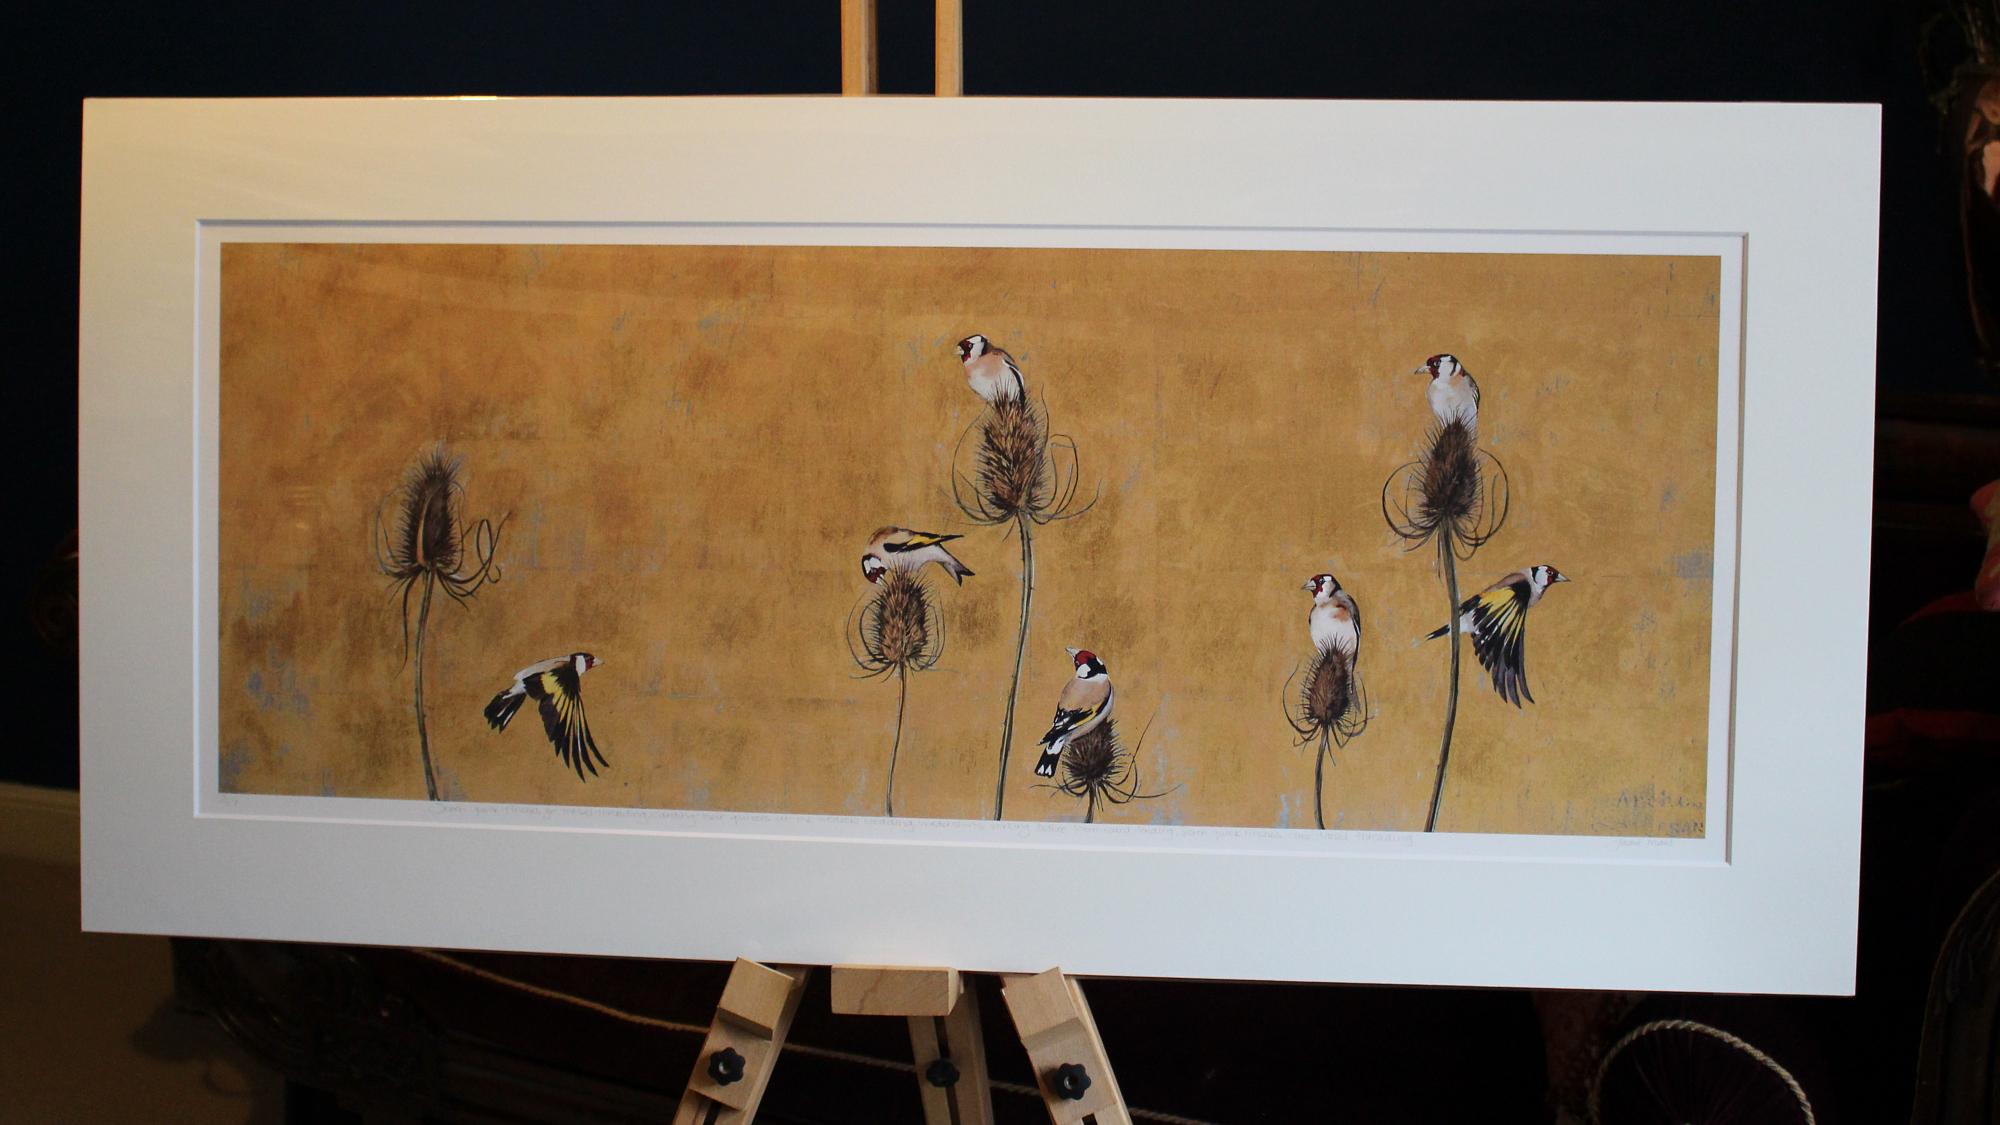 seven quick finches